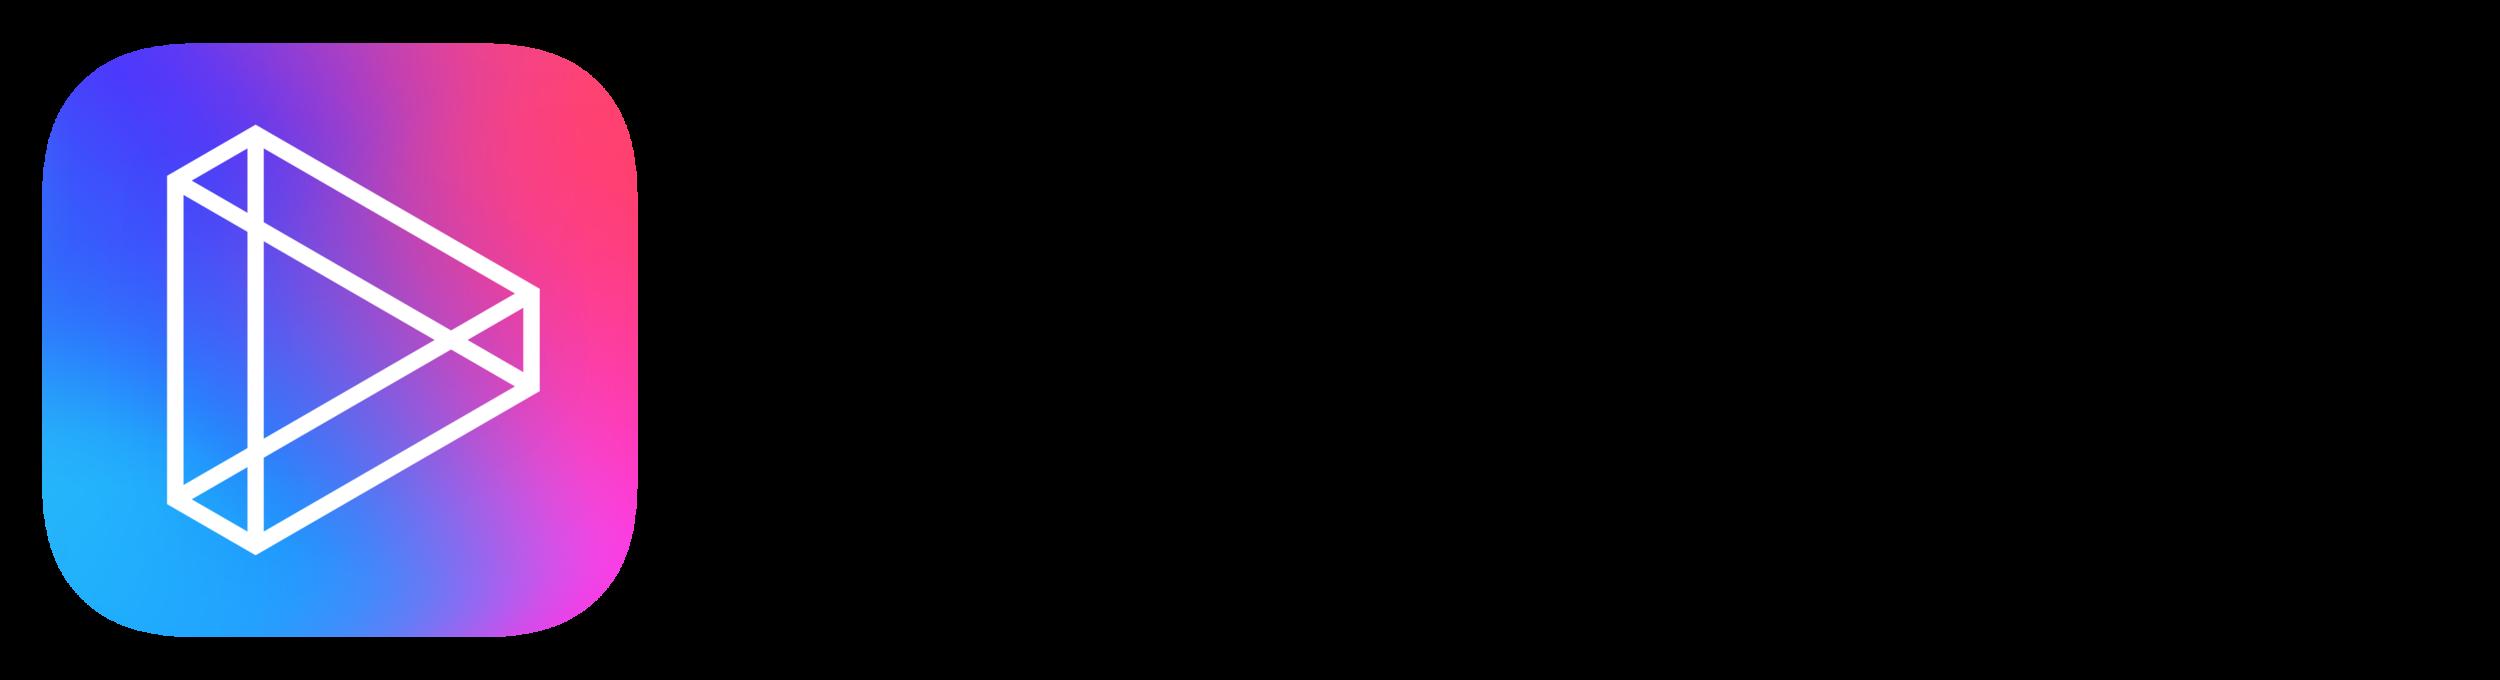 01_wesee_logo.png